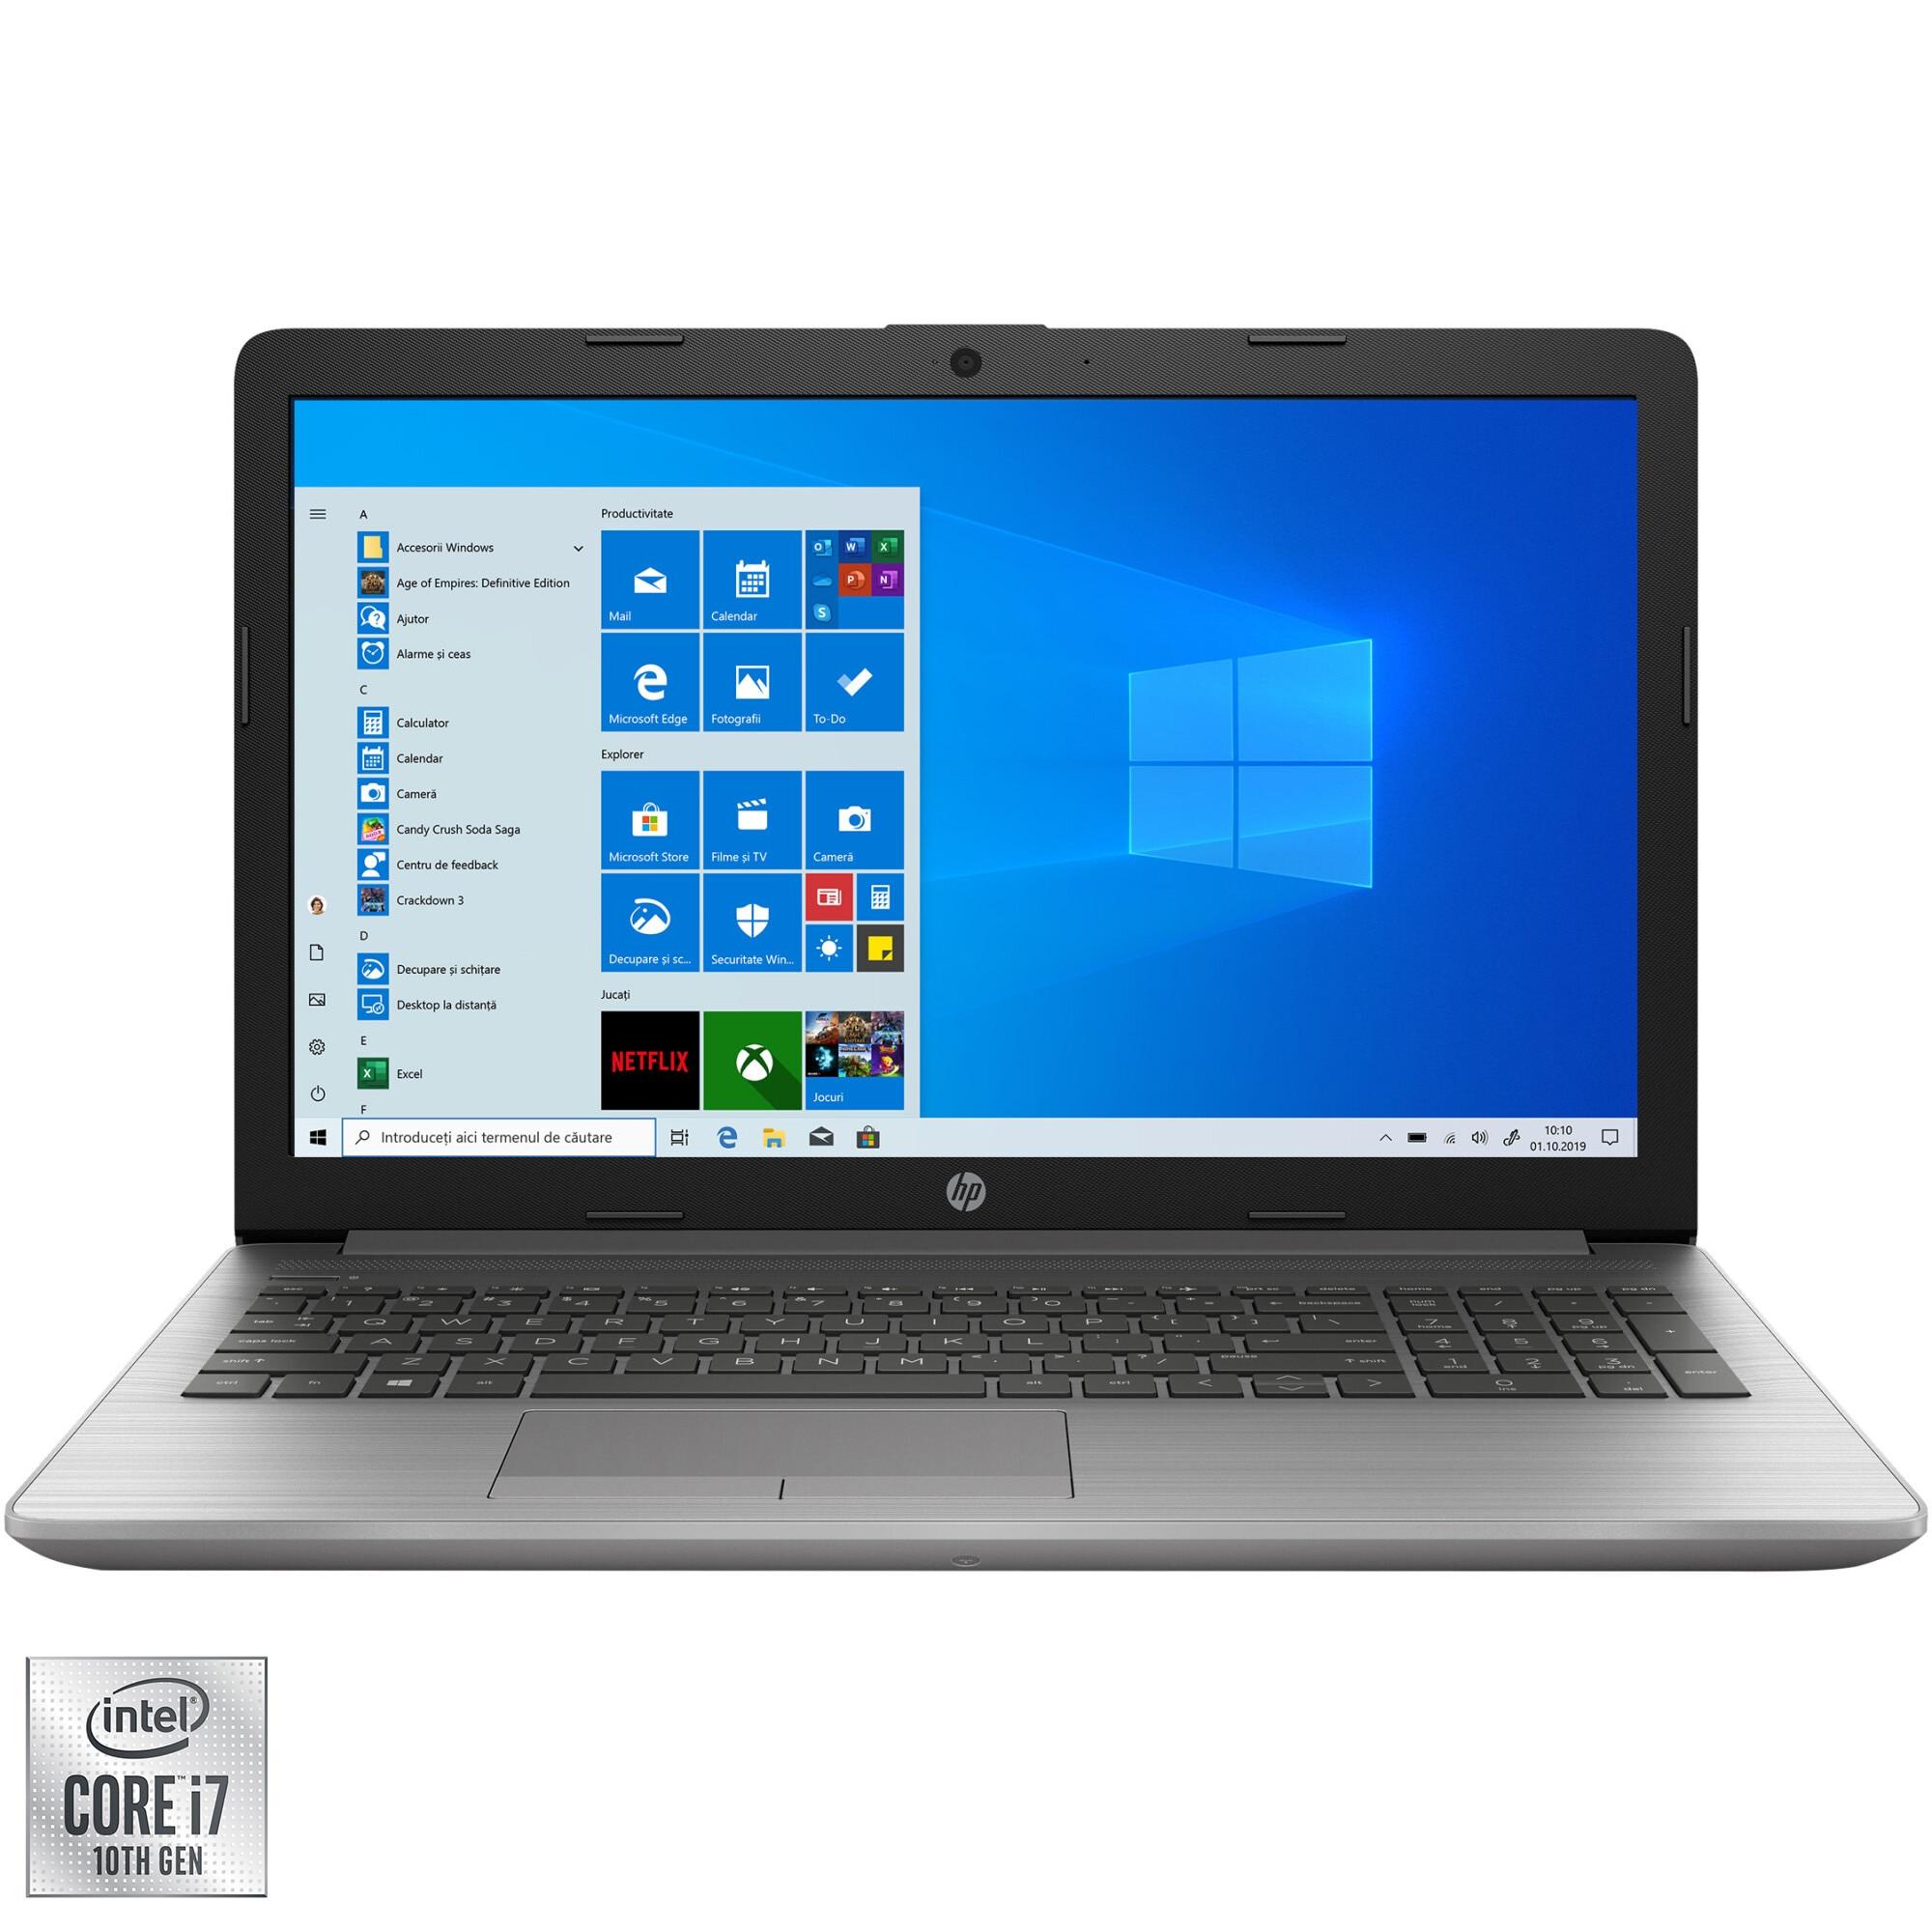 "Fotografie Laptop HP HP 250 G7 cu procesor Intel® Core™ i7-1065G7, 15.6"", Full HD, 8GB, 256GB SSD, Intel Iris Plus Graphics, Windows 10 Home, Silver"